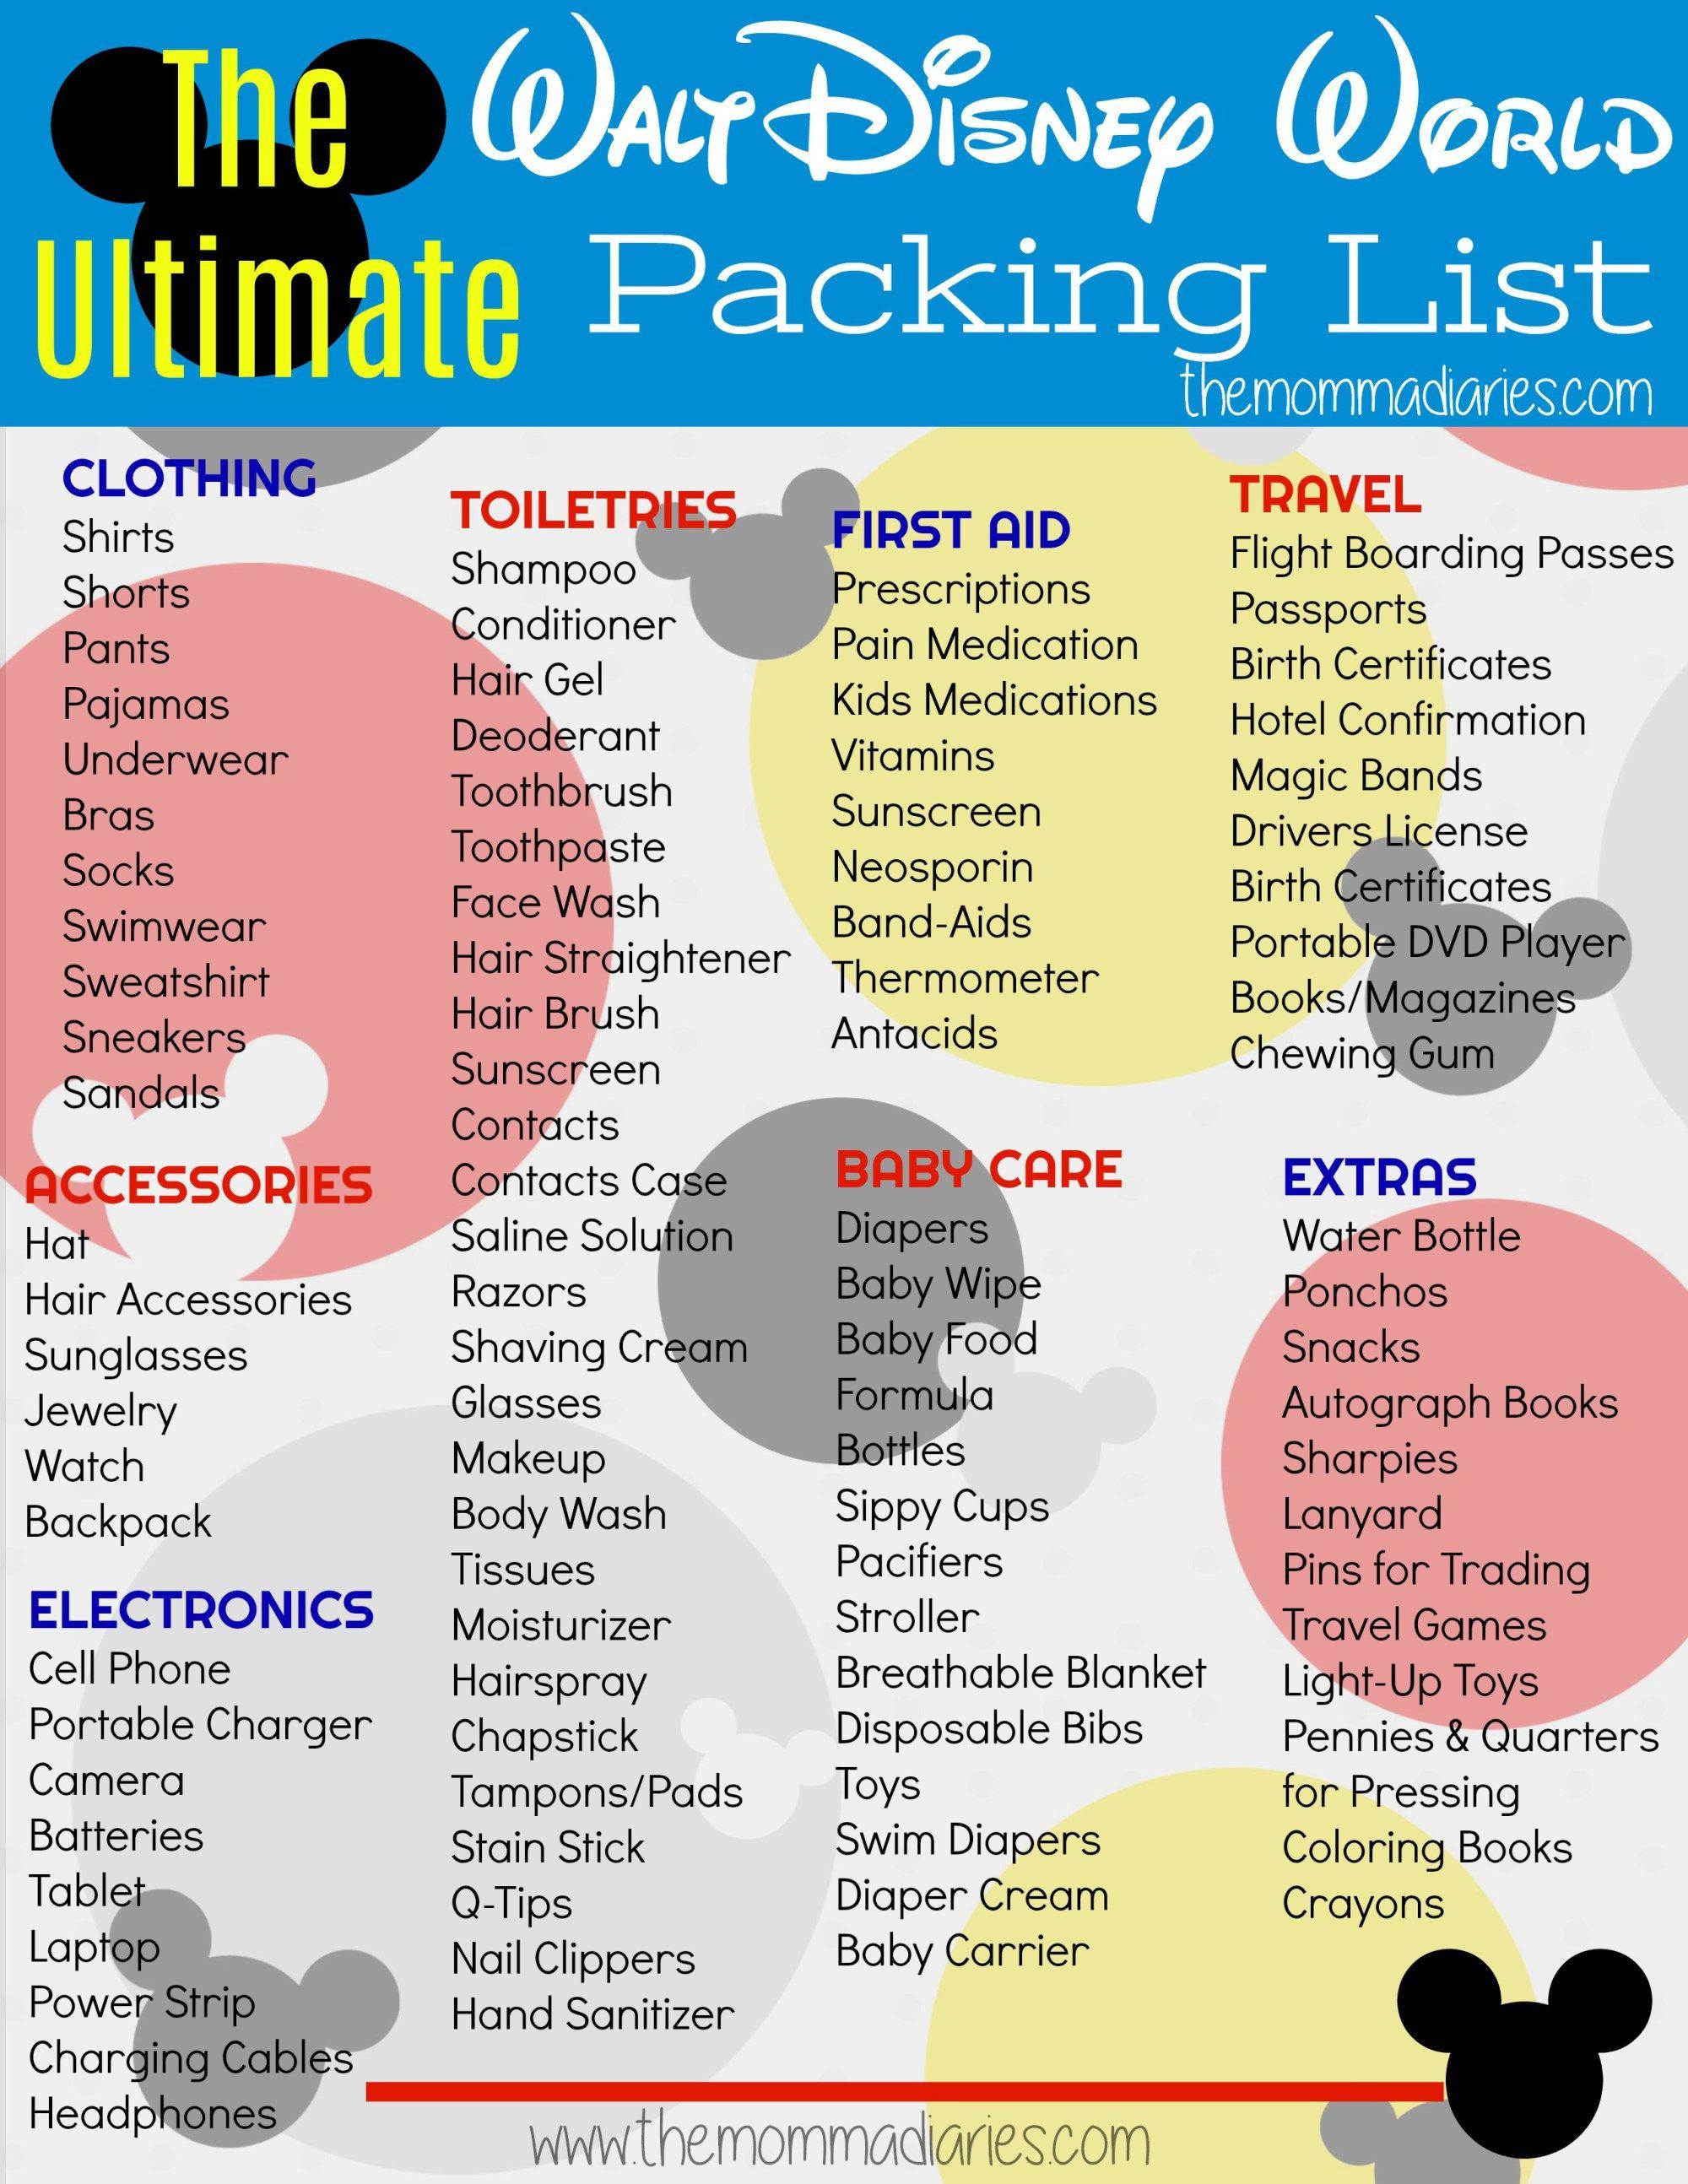 The Ultimate Disney Packing List + Free Printable | Disney